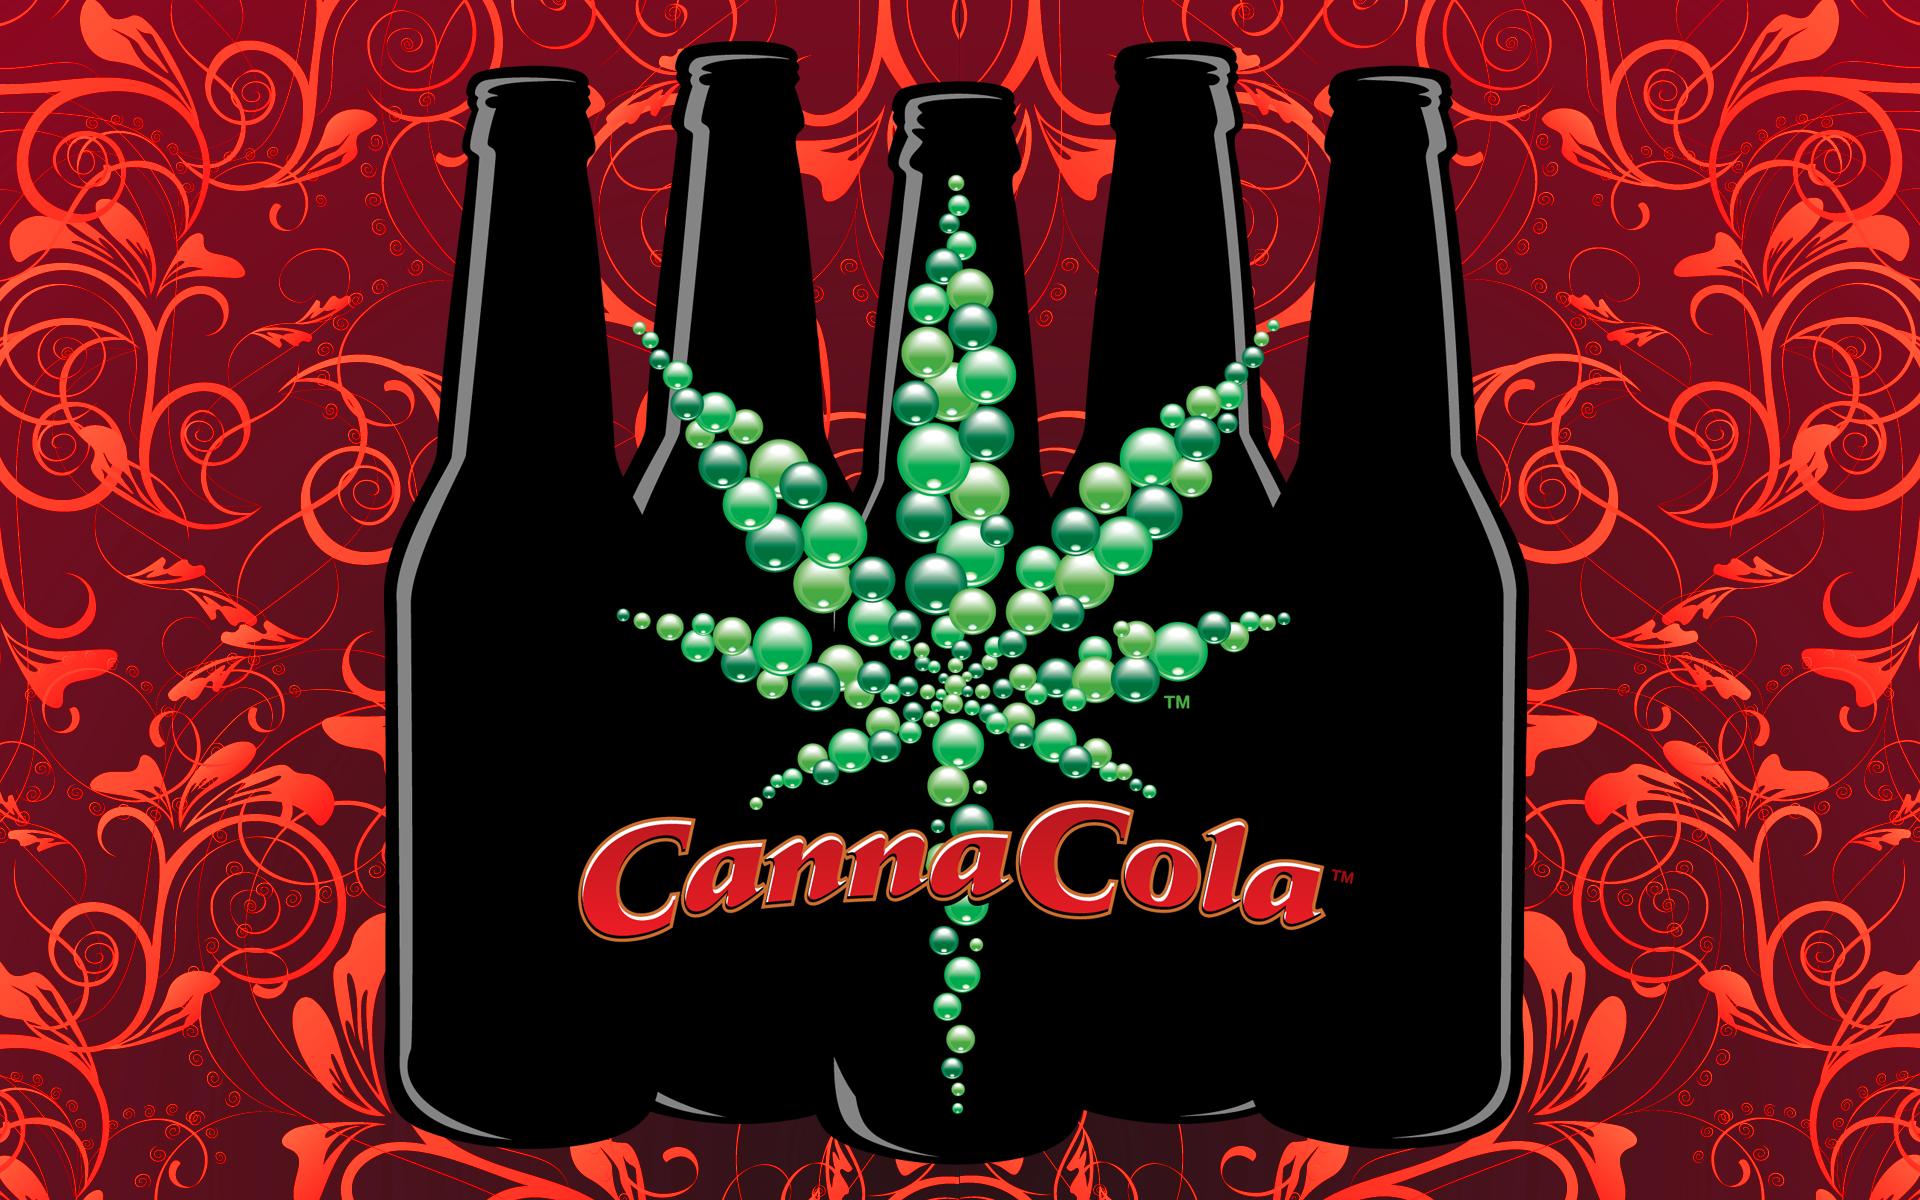 Canna Cola   Desktop Backgrounds Screeen Savers Print Quality Logos 1920x1200